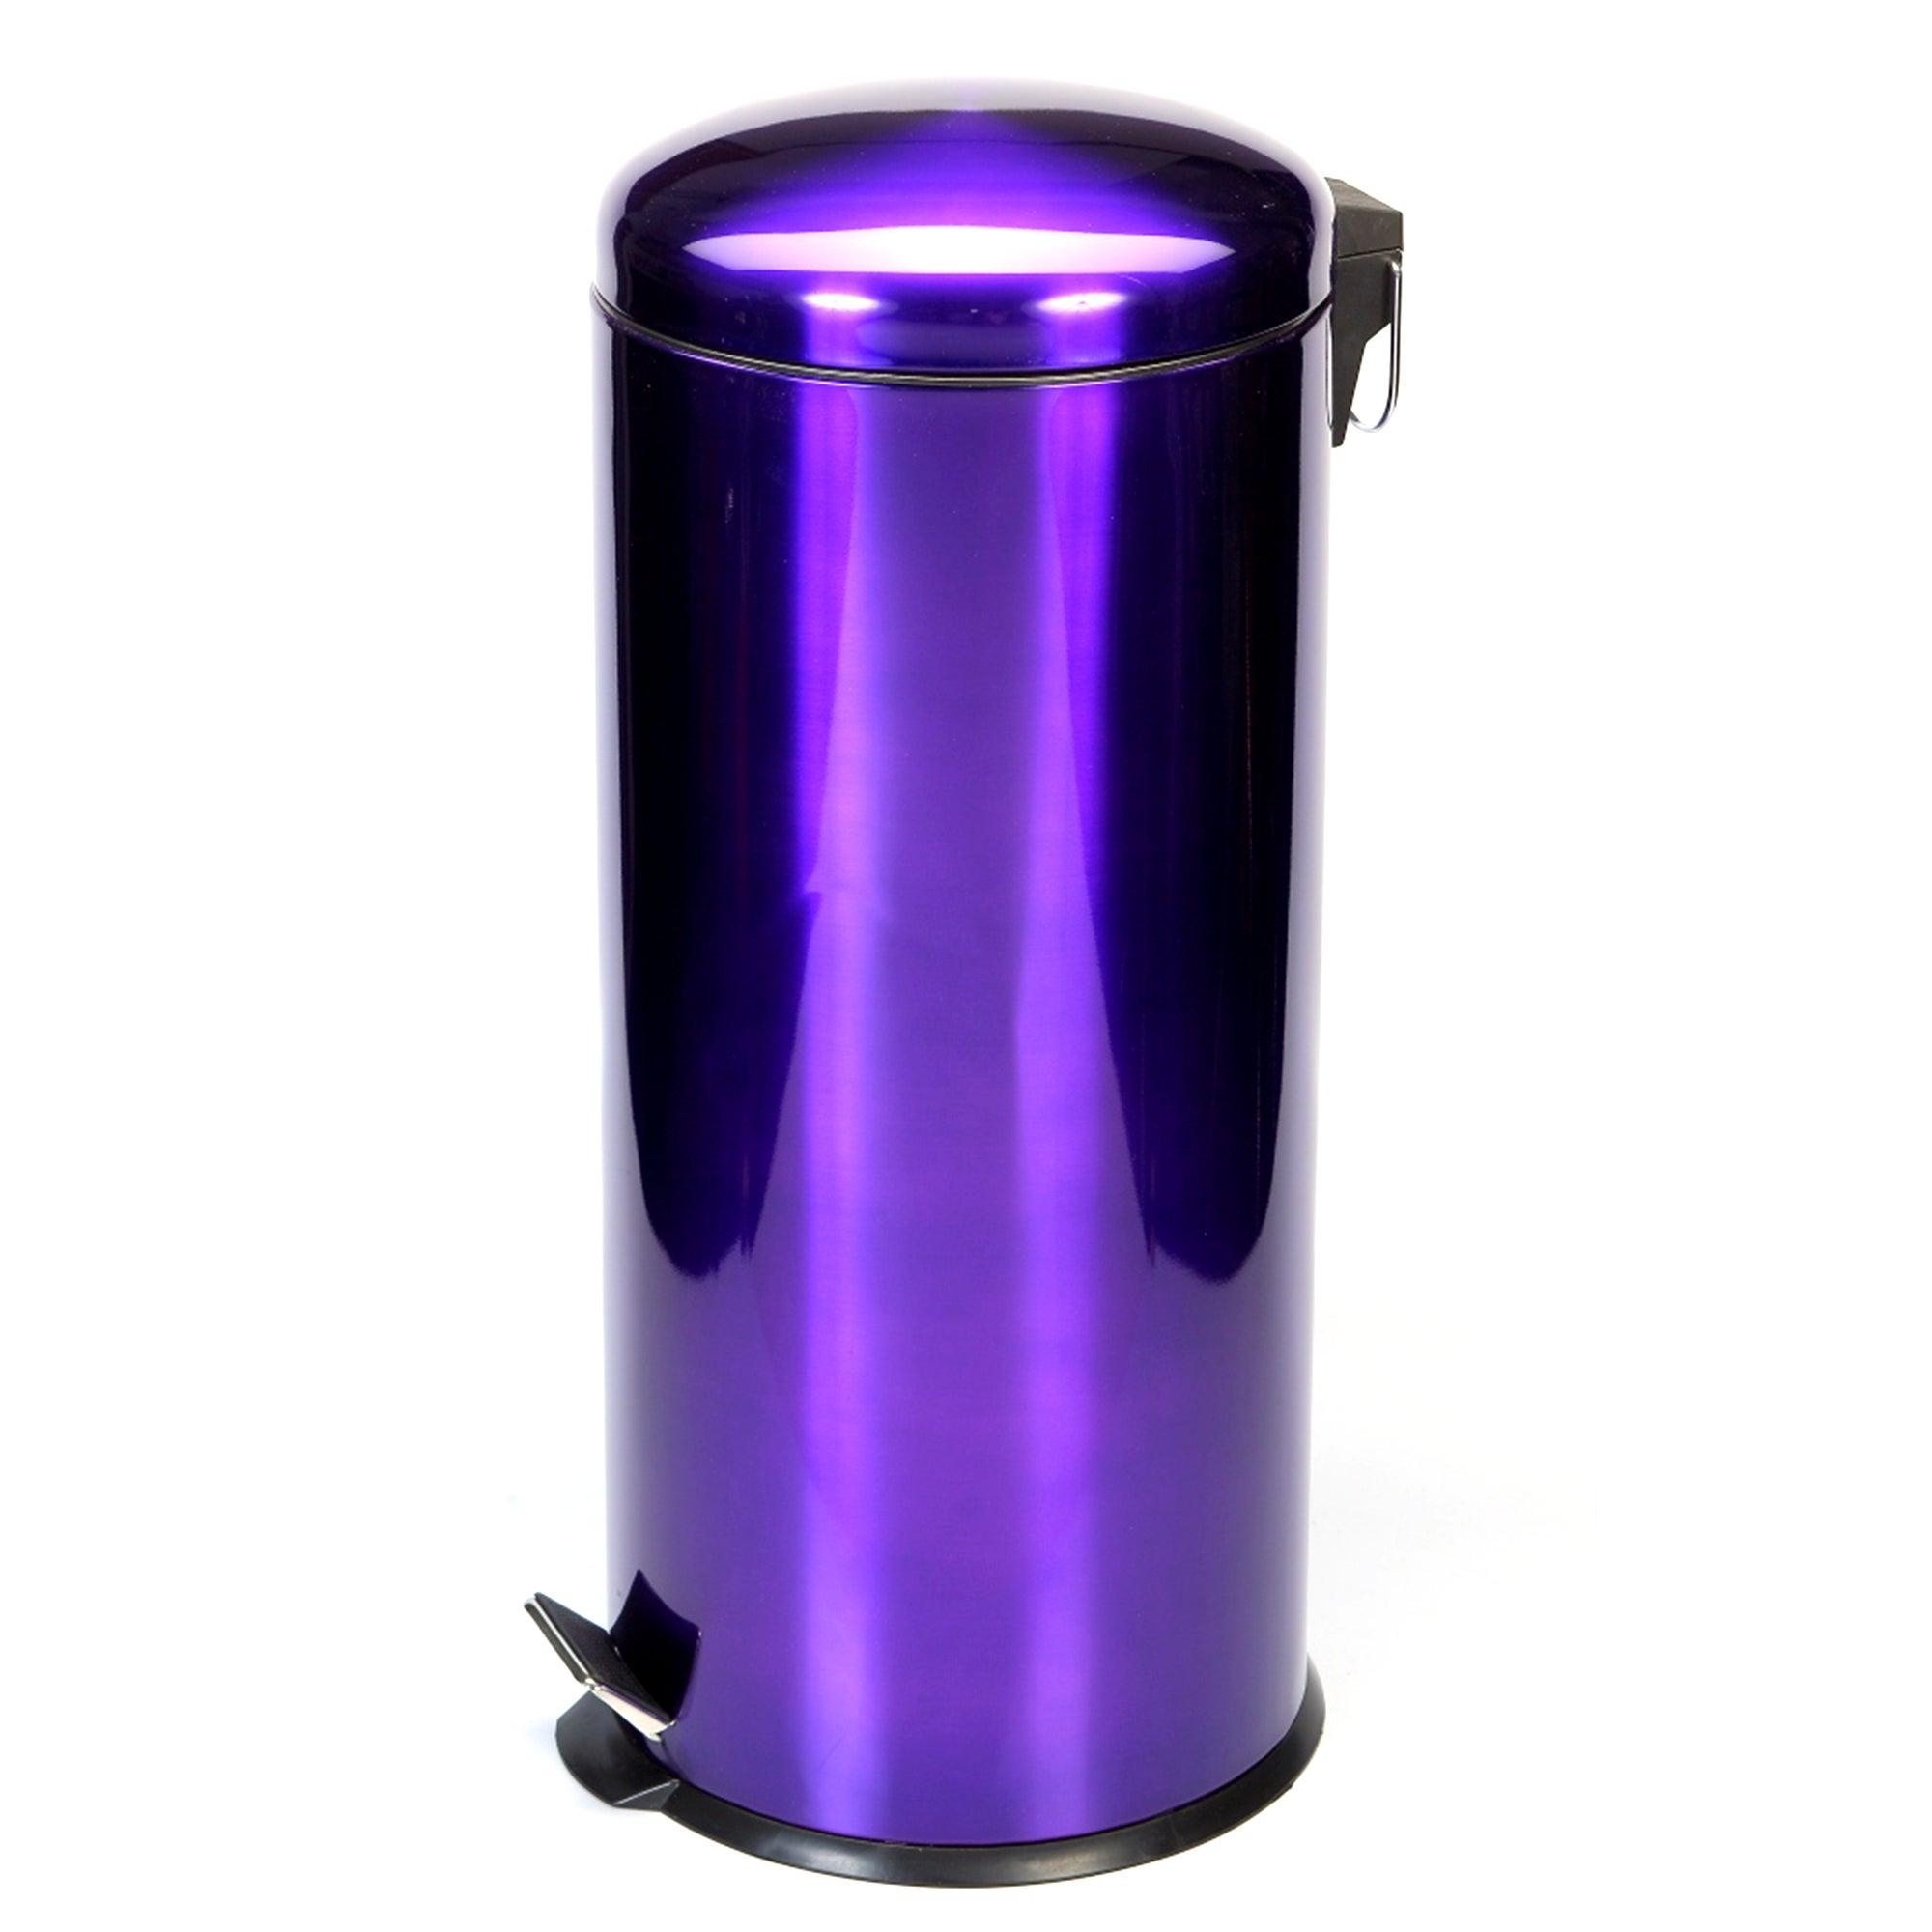 Purple Spectrum Collection Metallic 30 Litre Pedal Bin